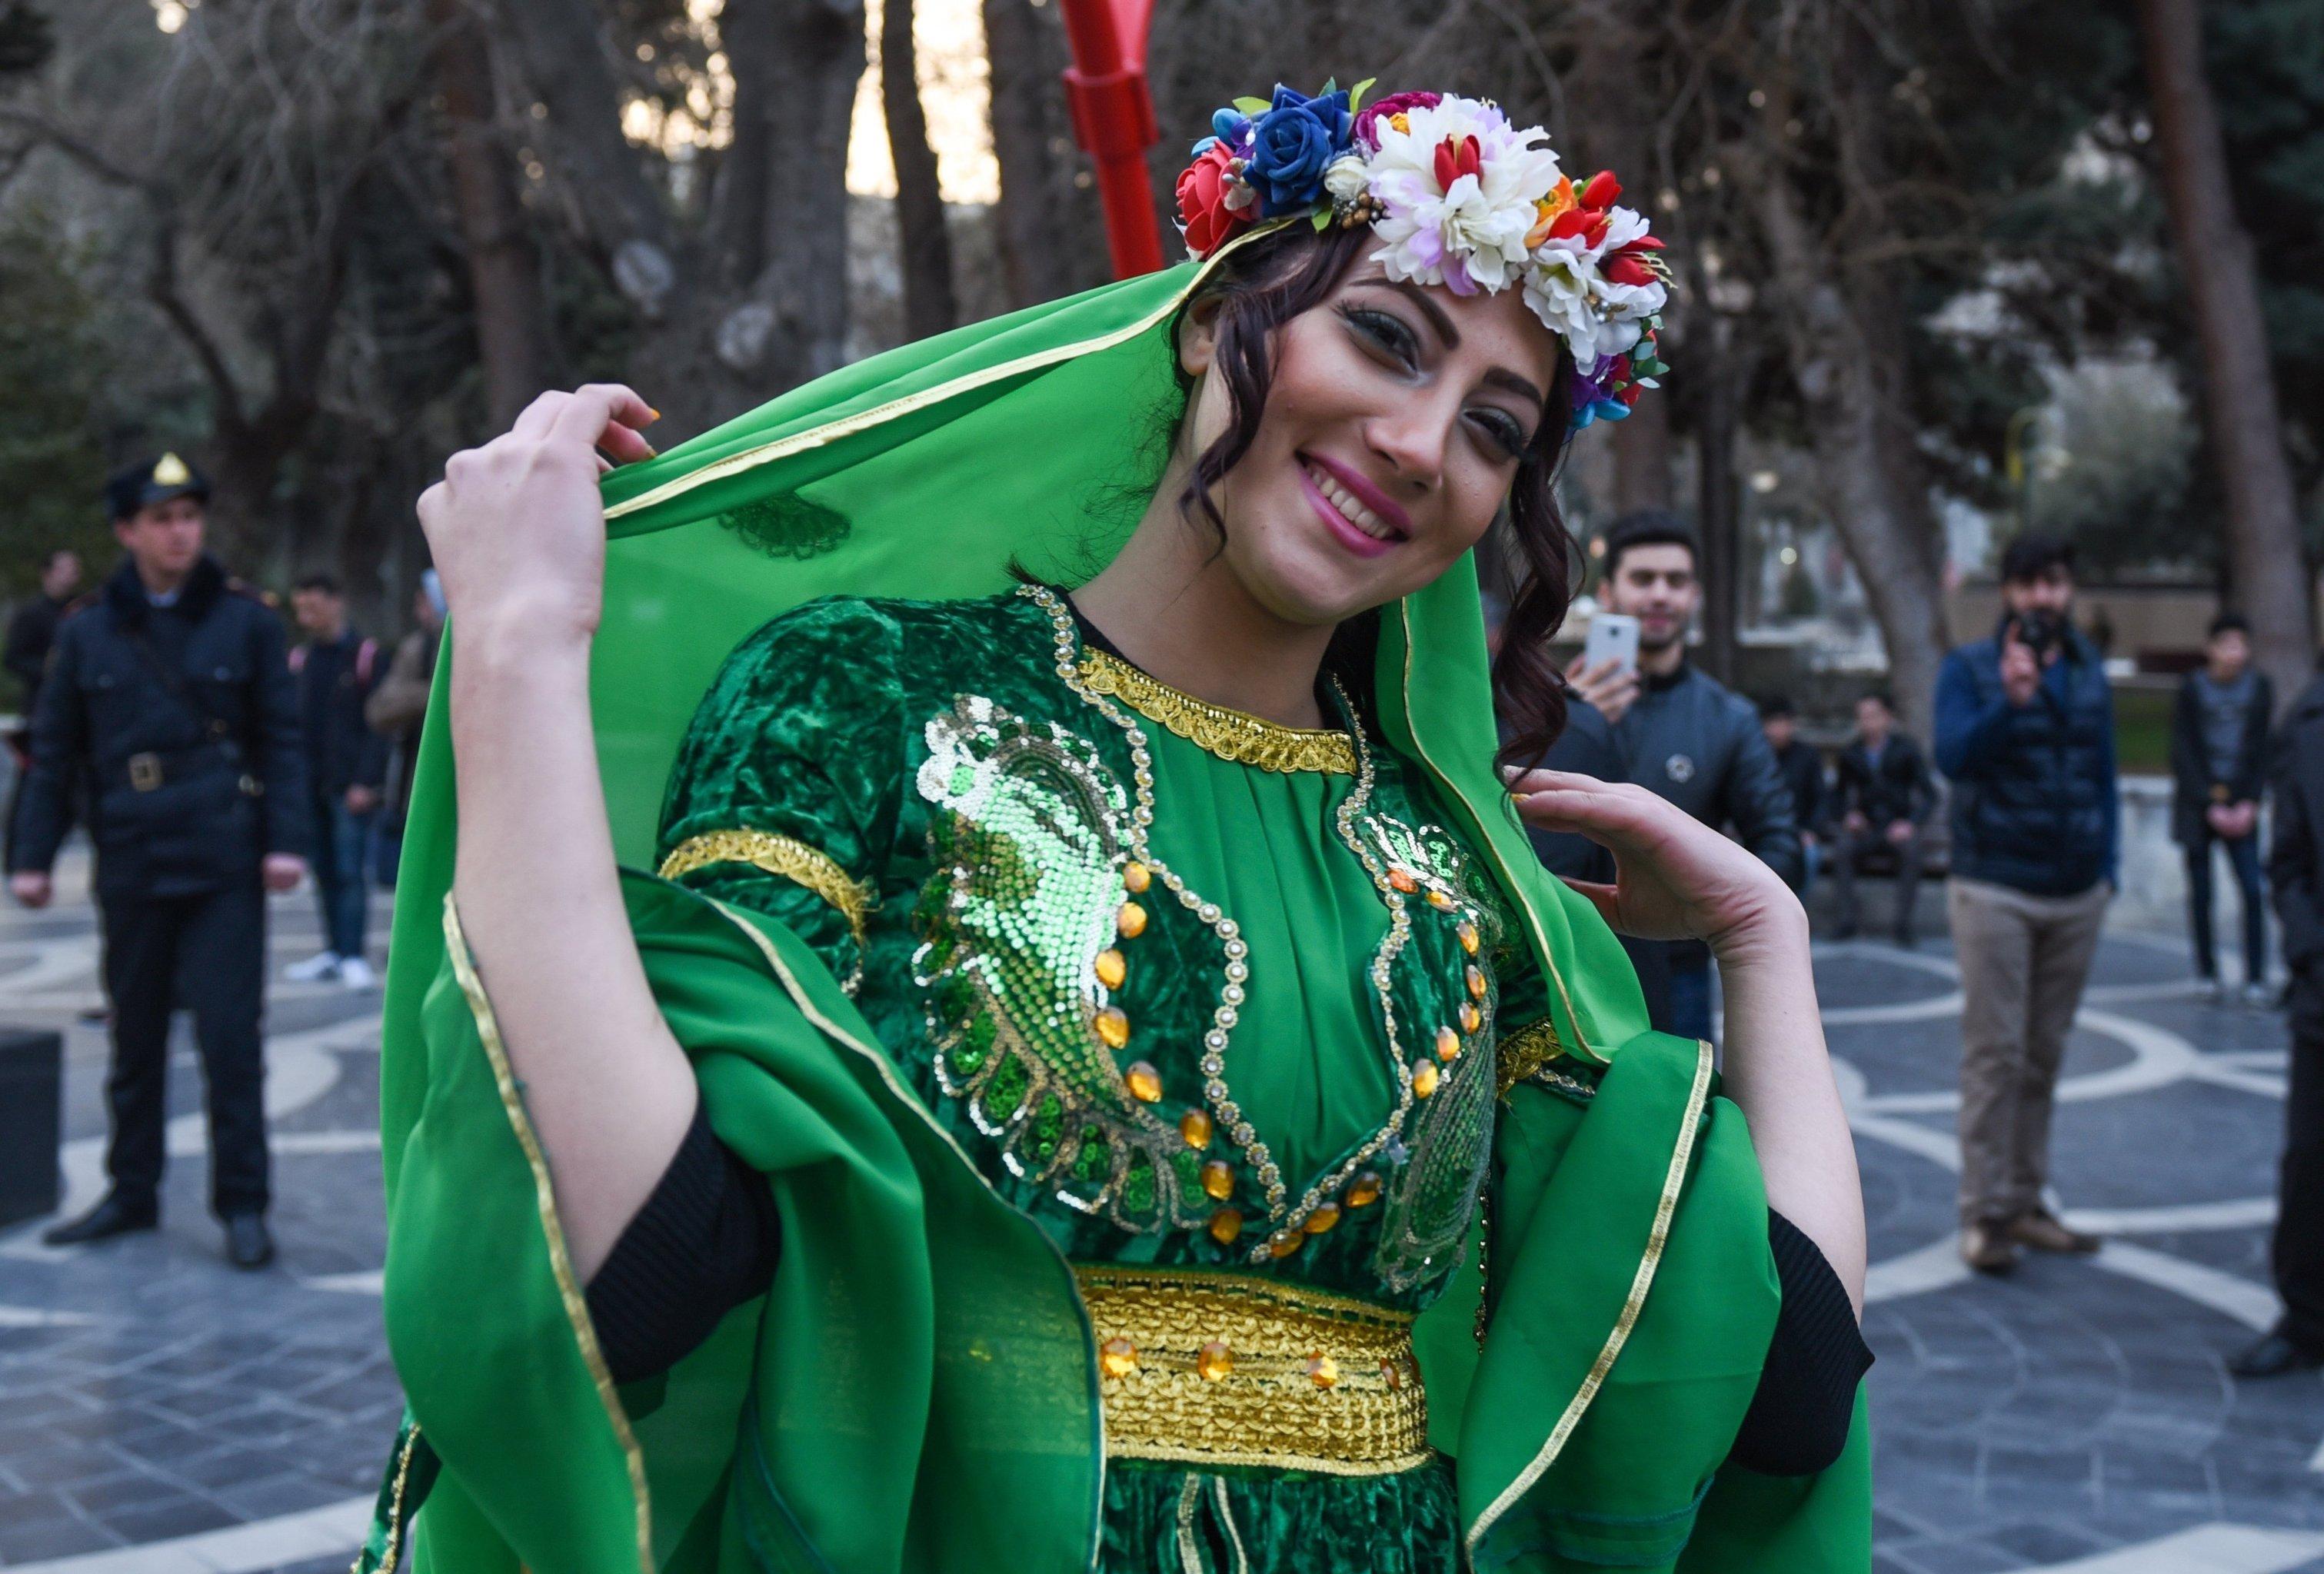 В Баку отметили Вторник земли перед праздником Новруз